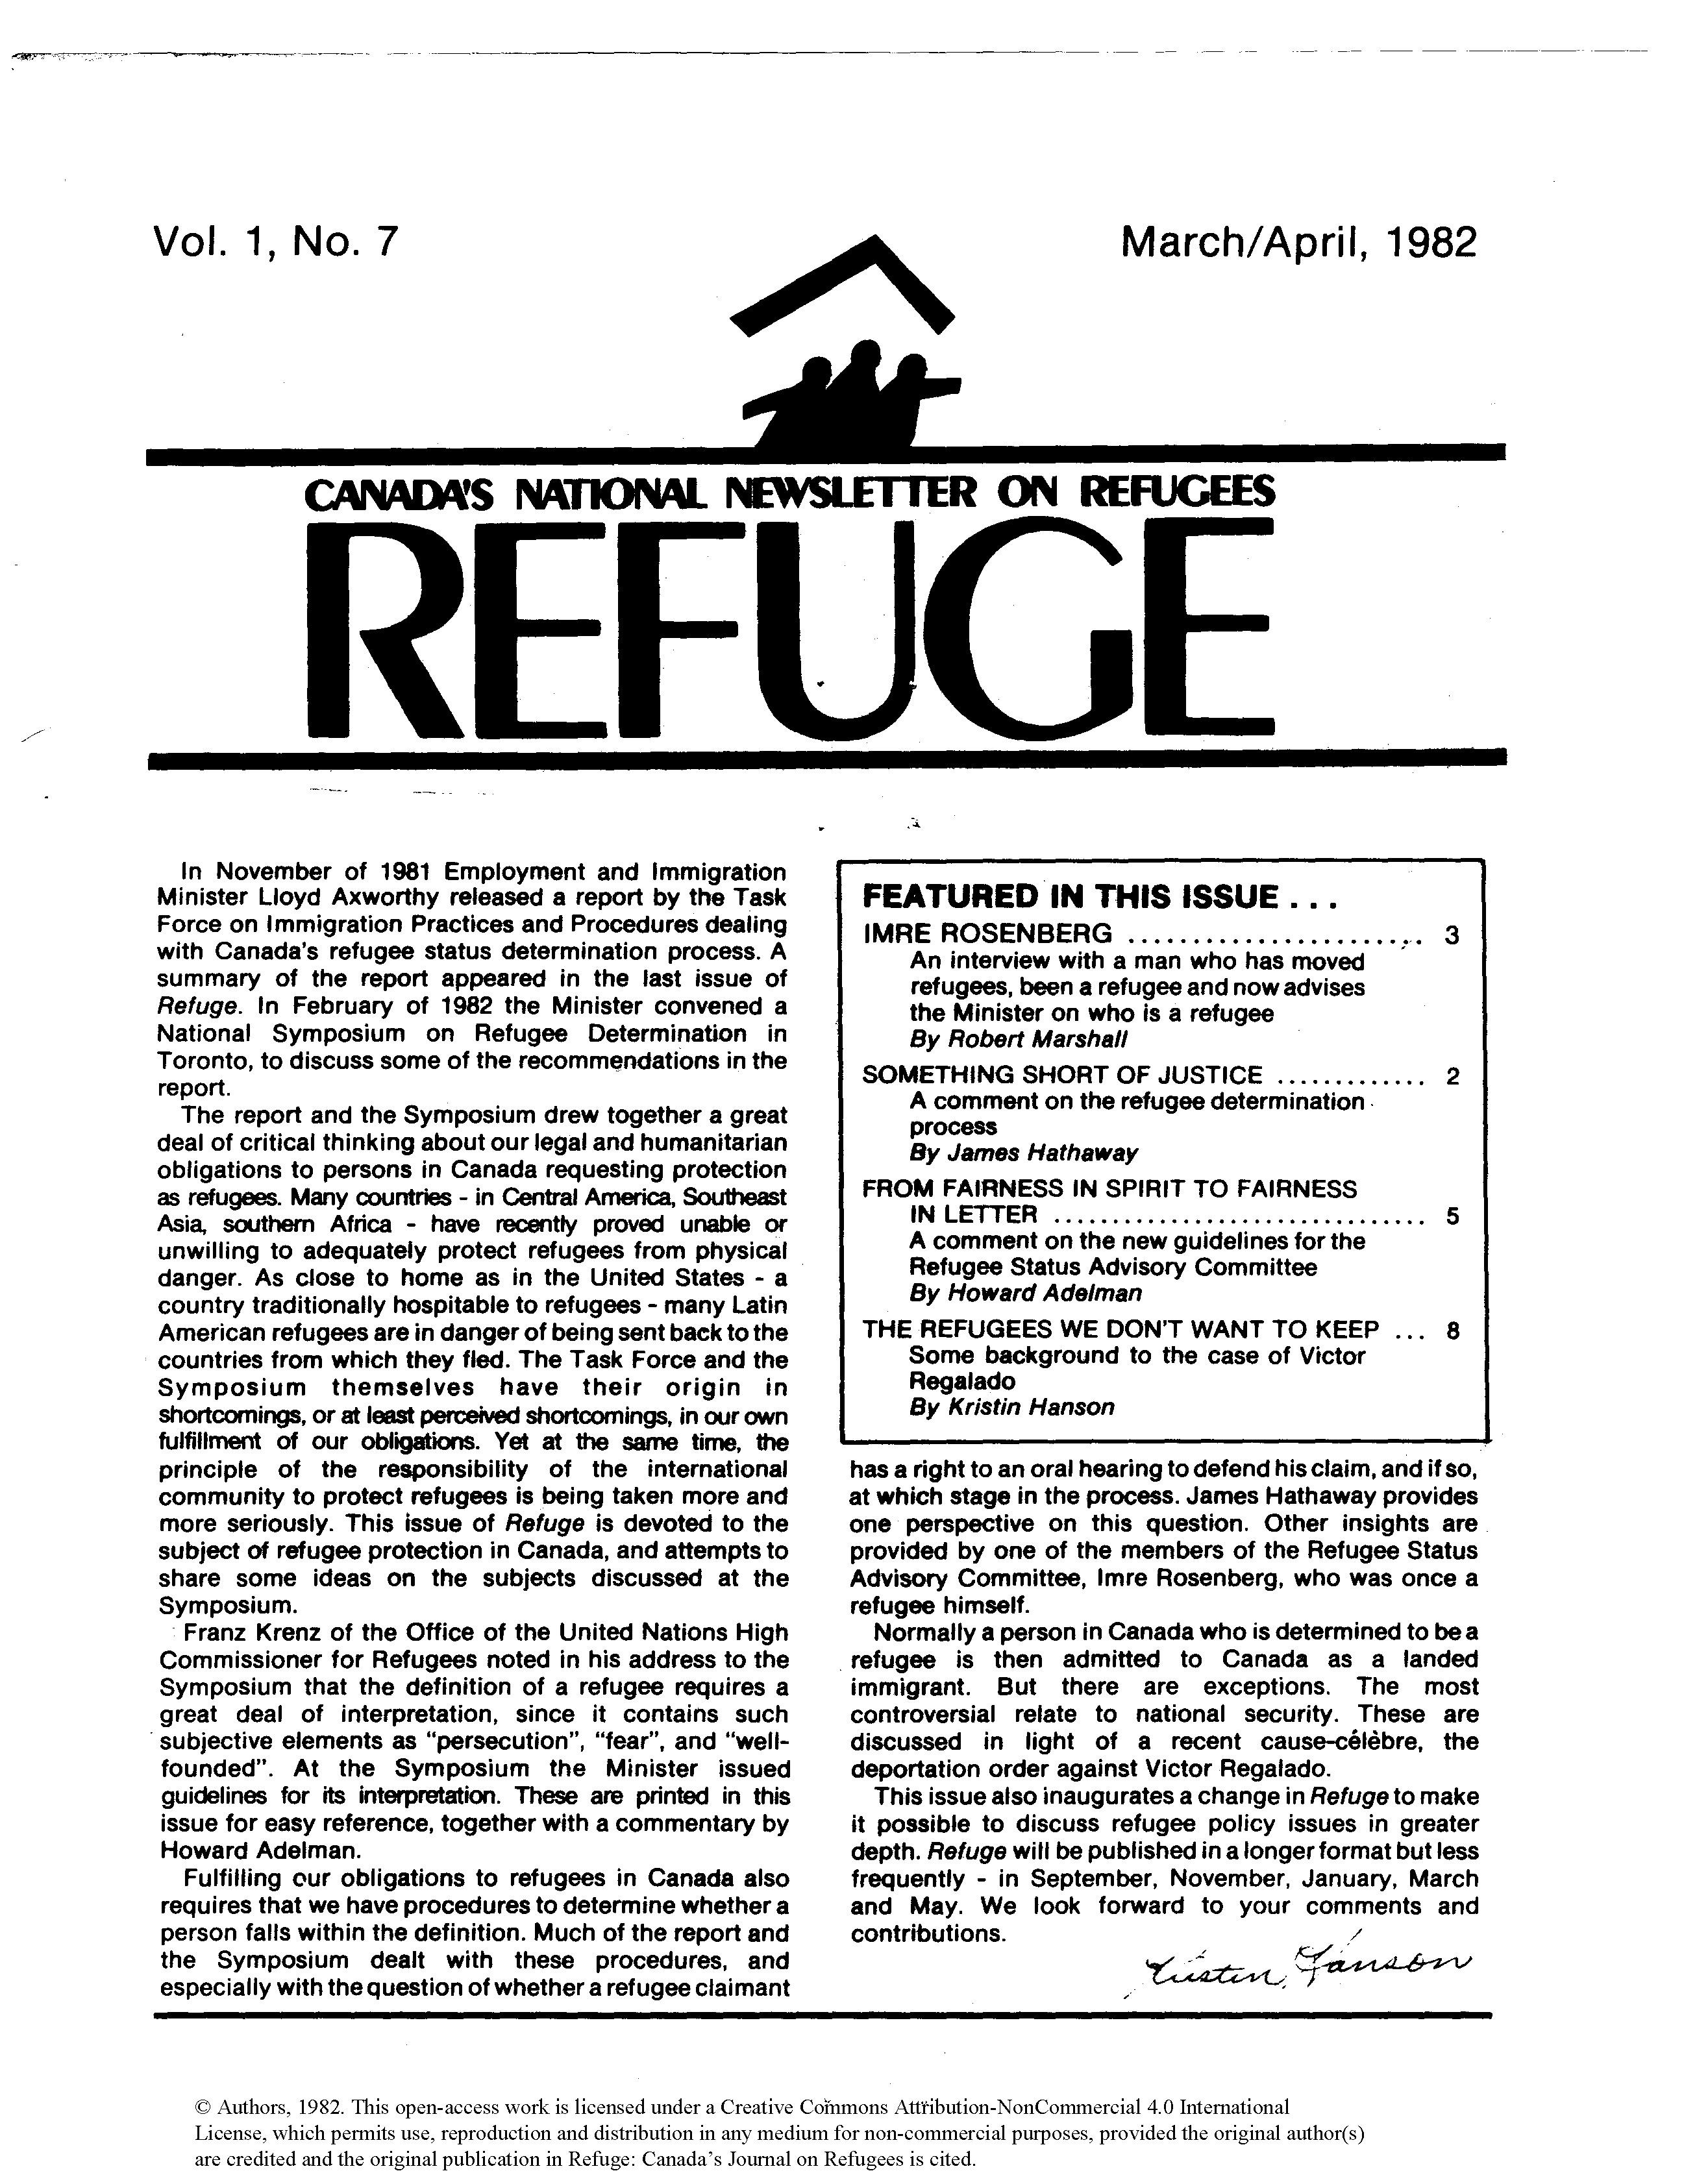 first page Refuge vol. 1.7 1982